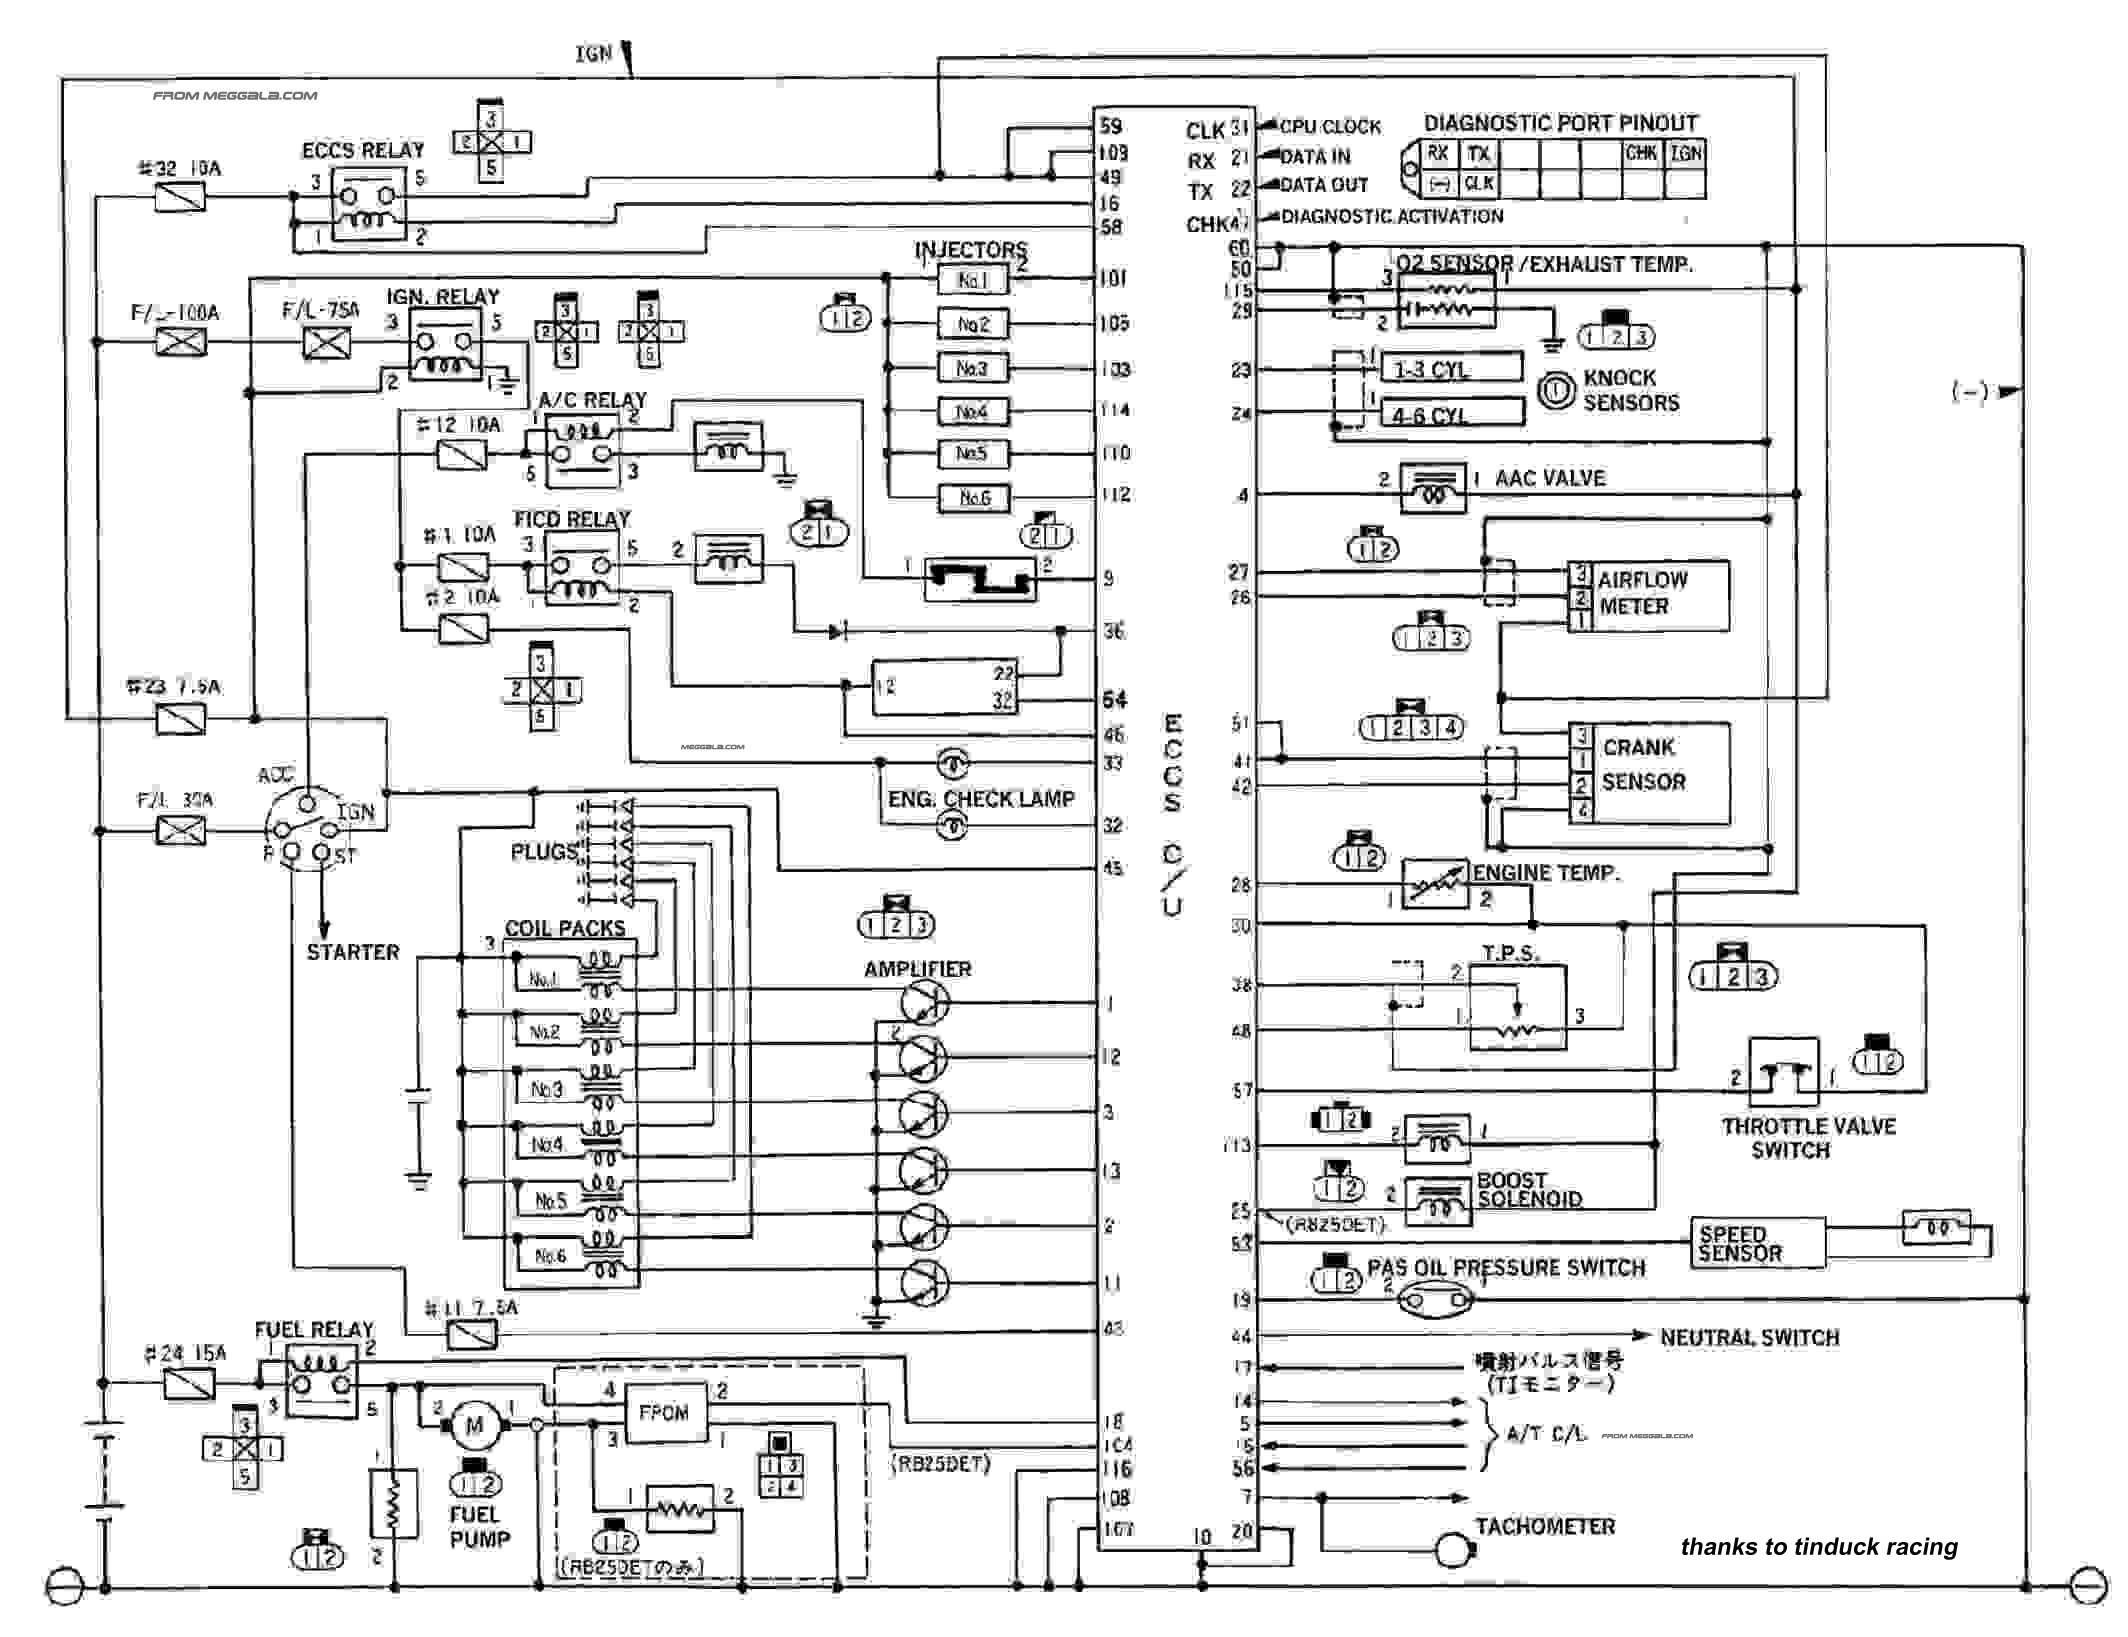 emc wiring diagrams diy enthusiasts wiring diagrams u2022 rh wiringdiagramnetwork today ecm wiring diagram 8v92 ecm wiring diagram 96 bronco